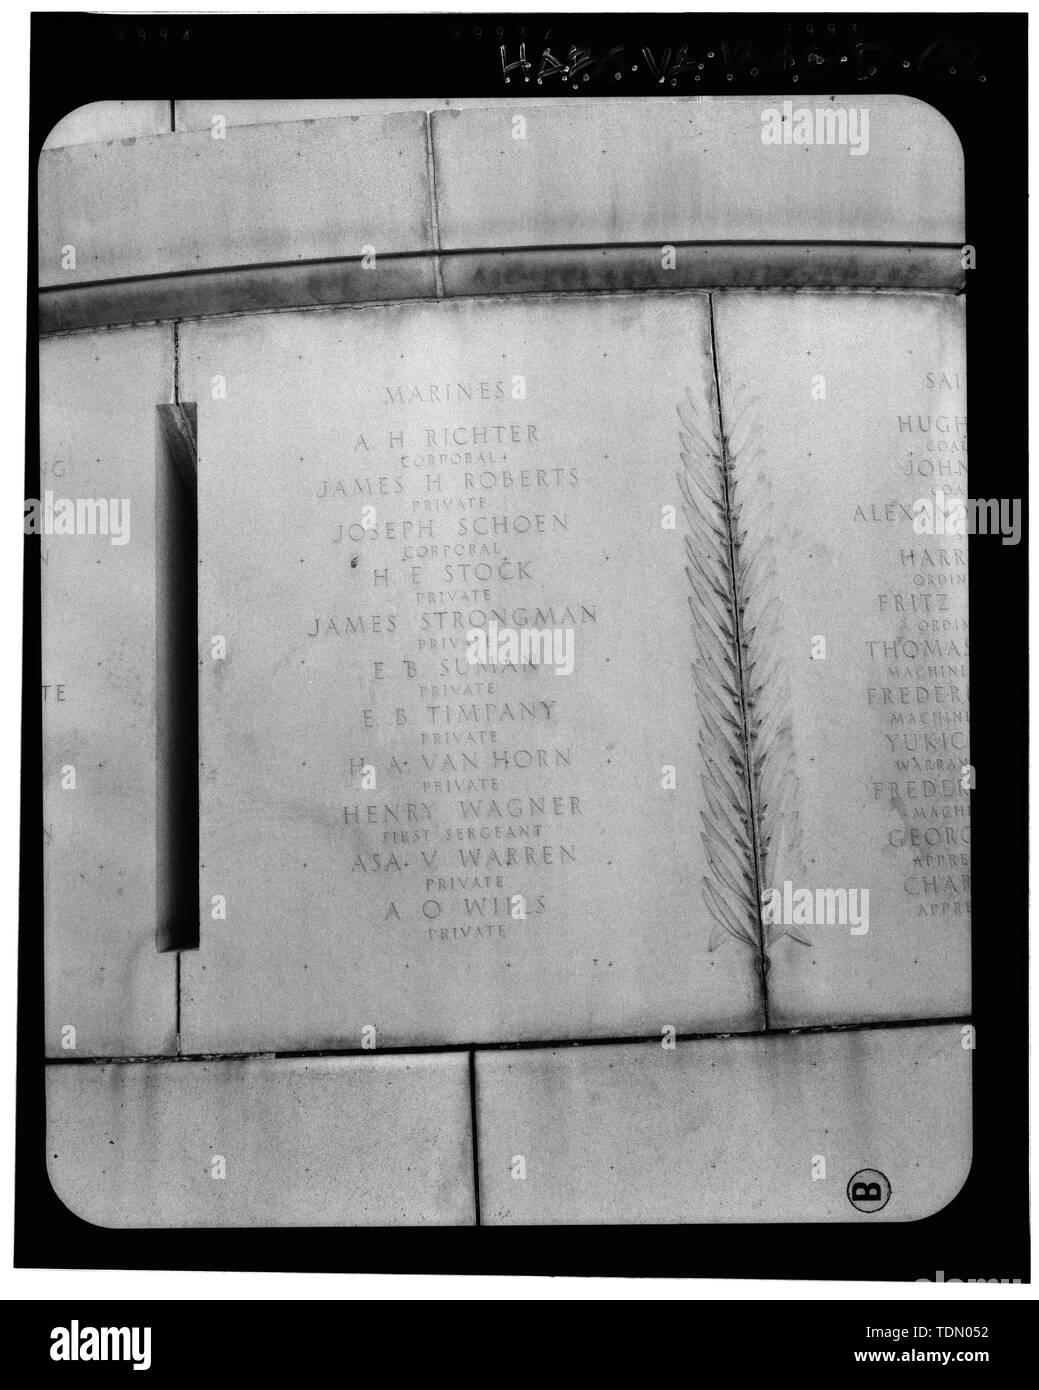 Panel 12 - Arlington National Cemetery, USS Maine Memorial, Arlington, Arlington County, VA; U.S. Army Corps of Engineers; Wyeth, Nathan C; Black, William M; Patrick, Mason M; Ferguson, H B; Bixby, W H; Goodson, W F; Lackawanna Steel Company; T.L. Huston Construction Company; Harris Brothers; Clark, D Lombillo; Primelles, Arturo; Rhodes, D H; Jenkins, Oliver B; Tilford, James D; Aleshire, J B; Stimson, H E; Scofield, John J; Hugh, R P; Houston, J B; Sharpe, Henry G; Downey, G F; Clem, L; Cosby, Spencer; Taft, William Howard; Commission of Fine Arts; Olmsted, Fredrick Law; French, Daniel Cheste - Stock Image